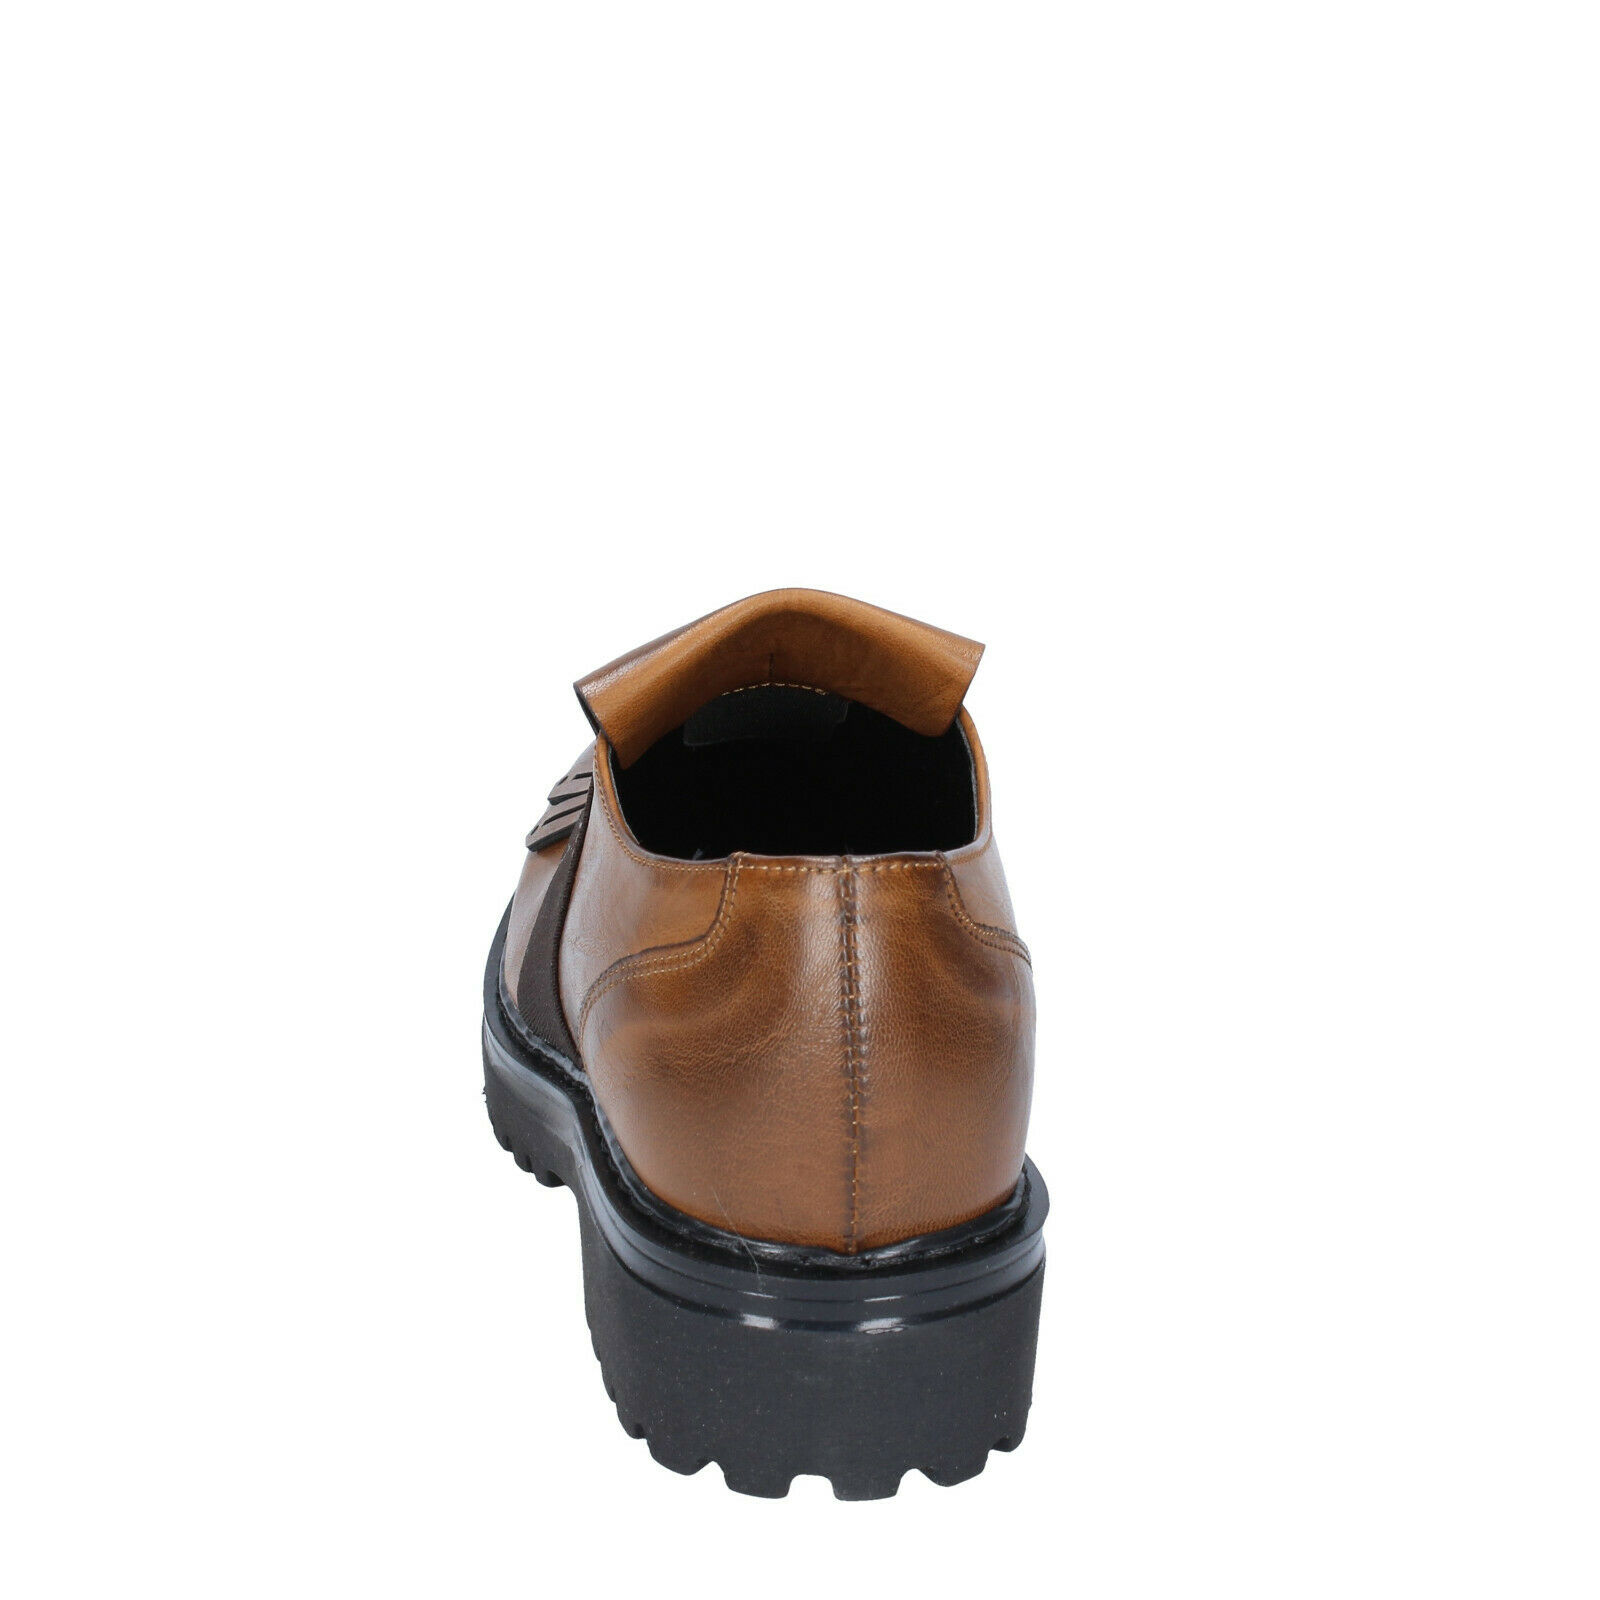 Wouomo scarpe OLGA OLGA OLGA RUBINI 10 (EU 40) slip on Marroneee leather BS860-40 12443b